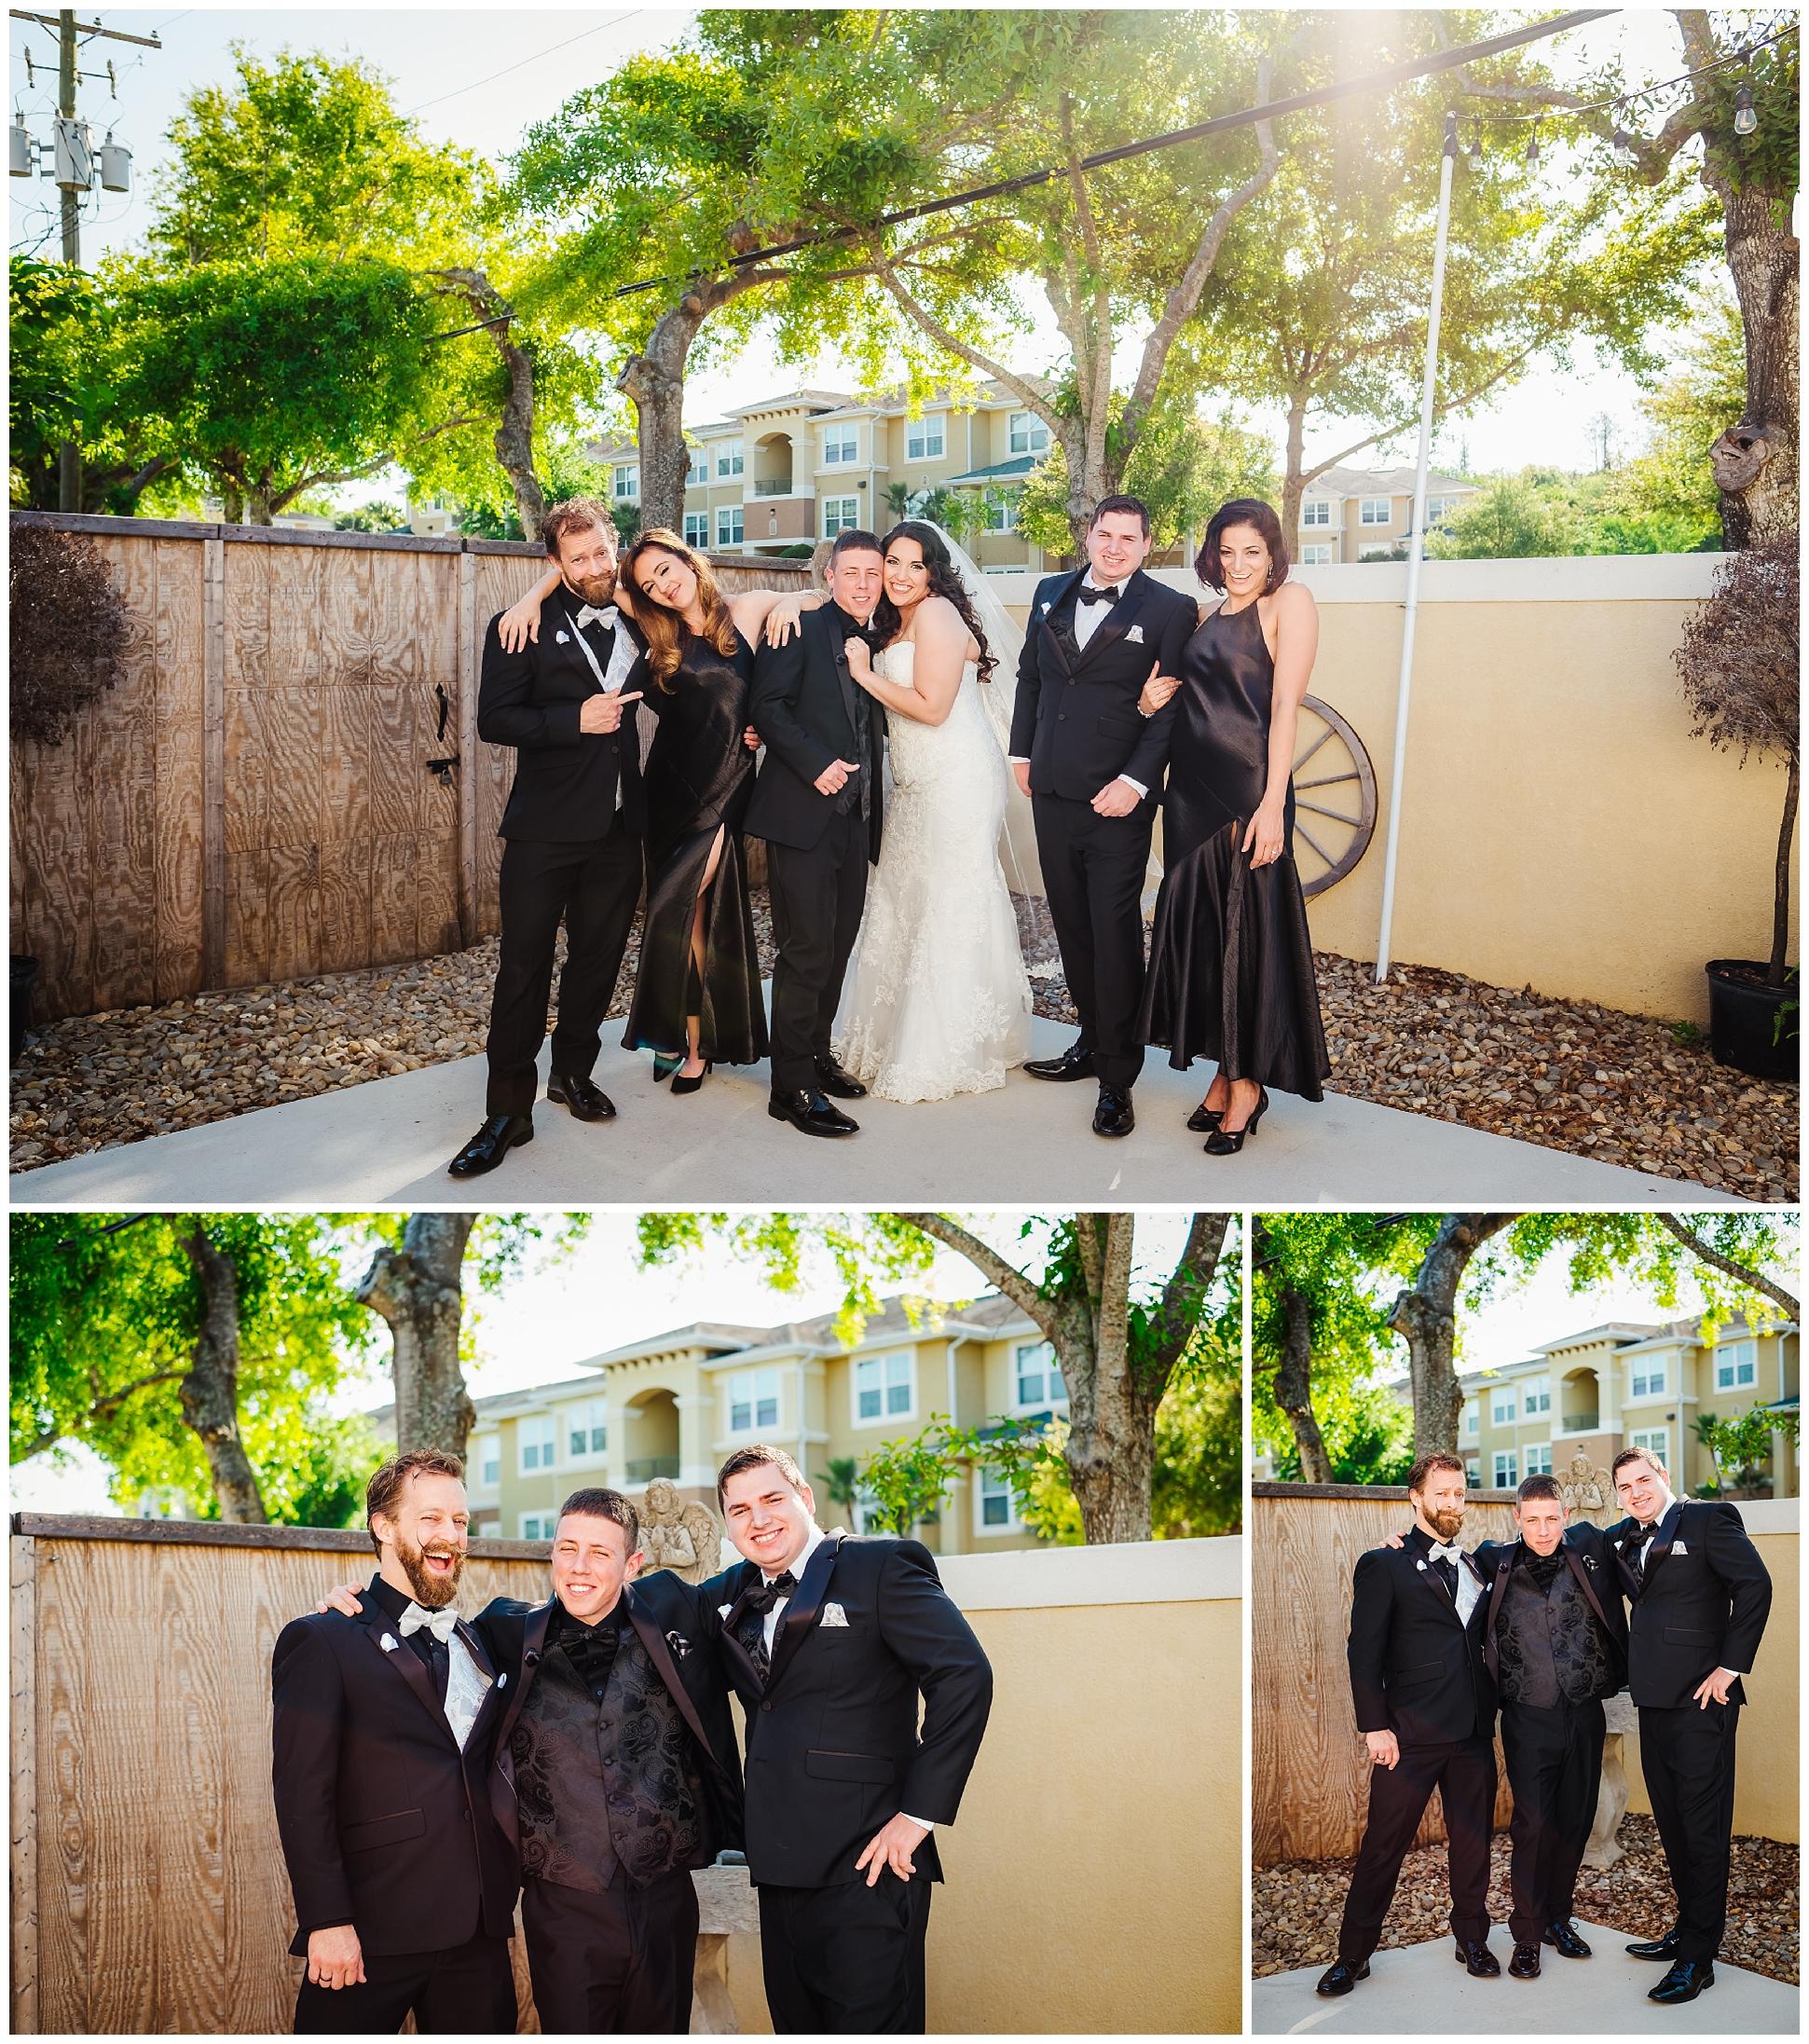 tampa-wedding-photographer-unique-indoor-venue_0035.jpg